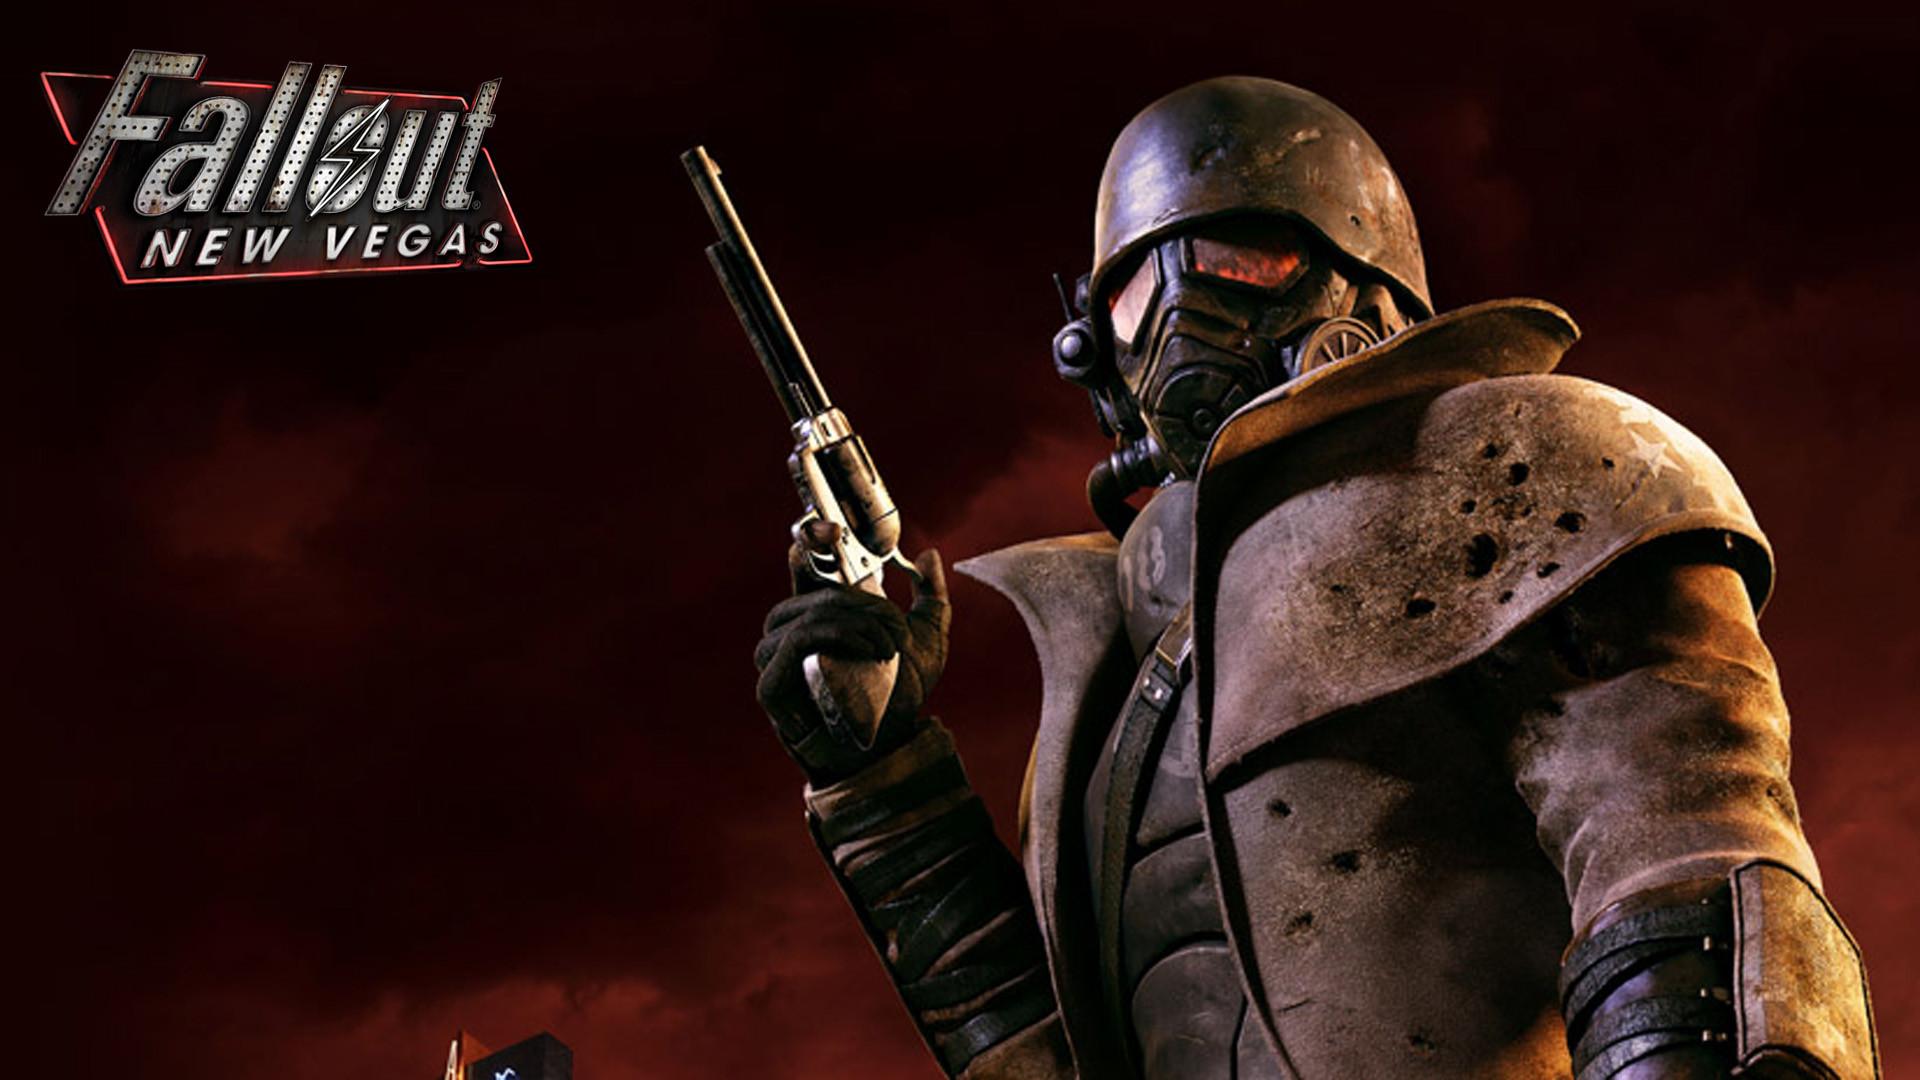 Fallout New Vegas Wallpaper 1080p (82+ Images